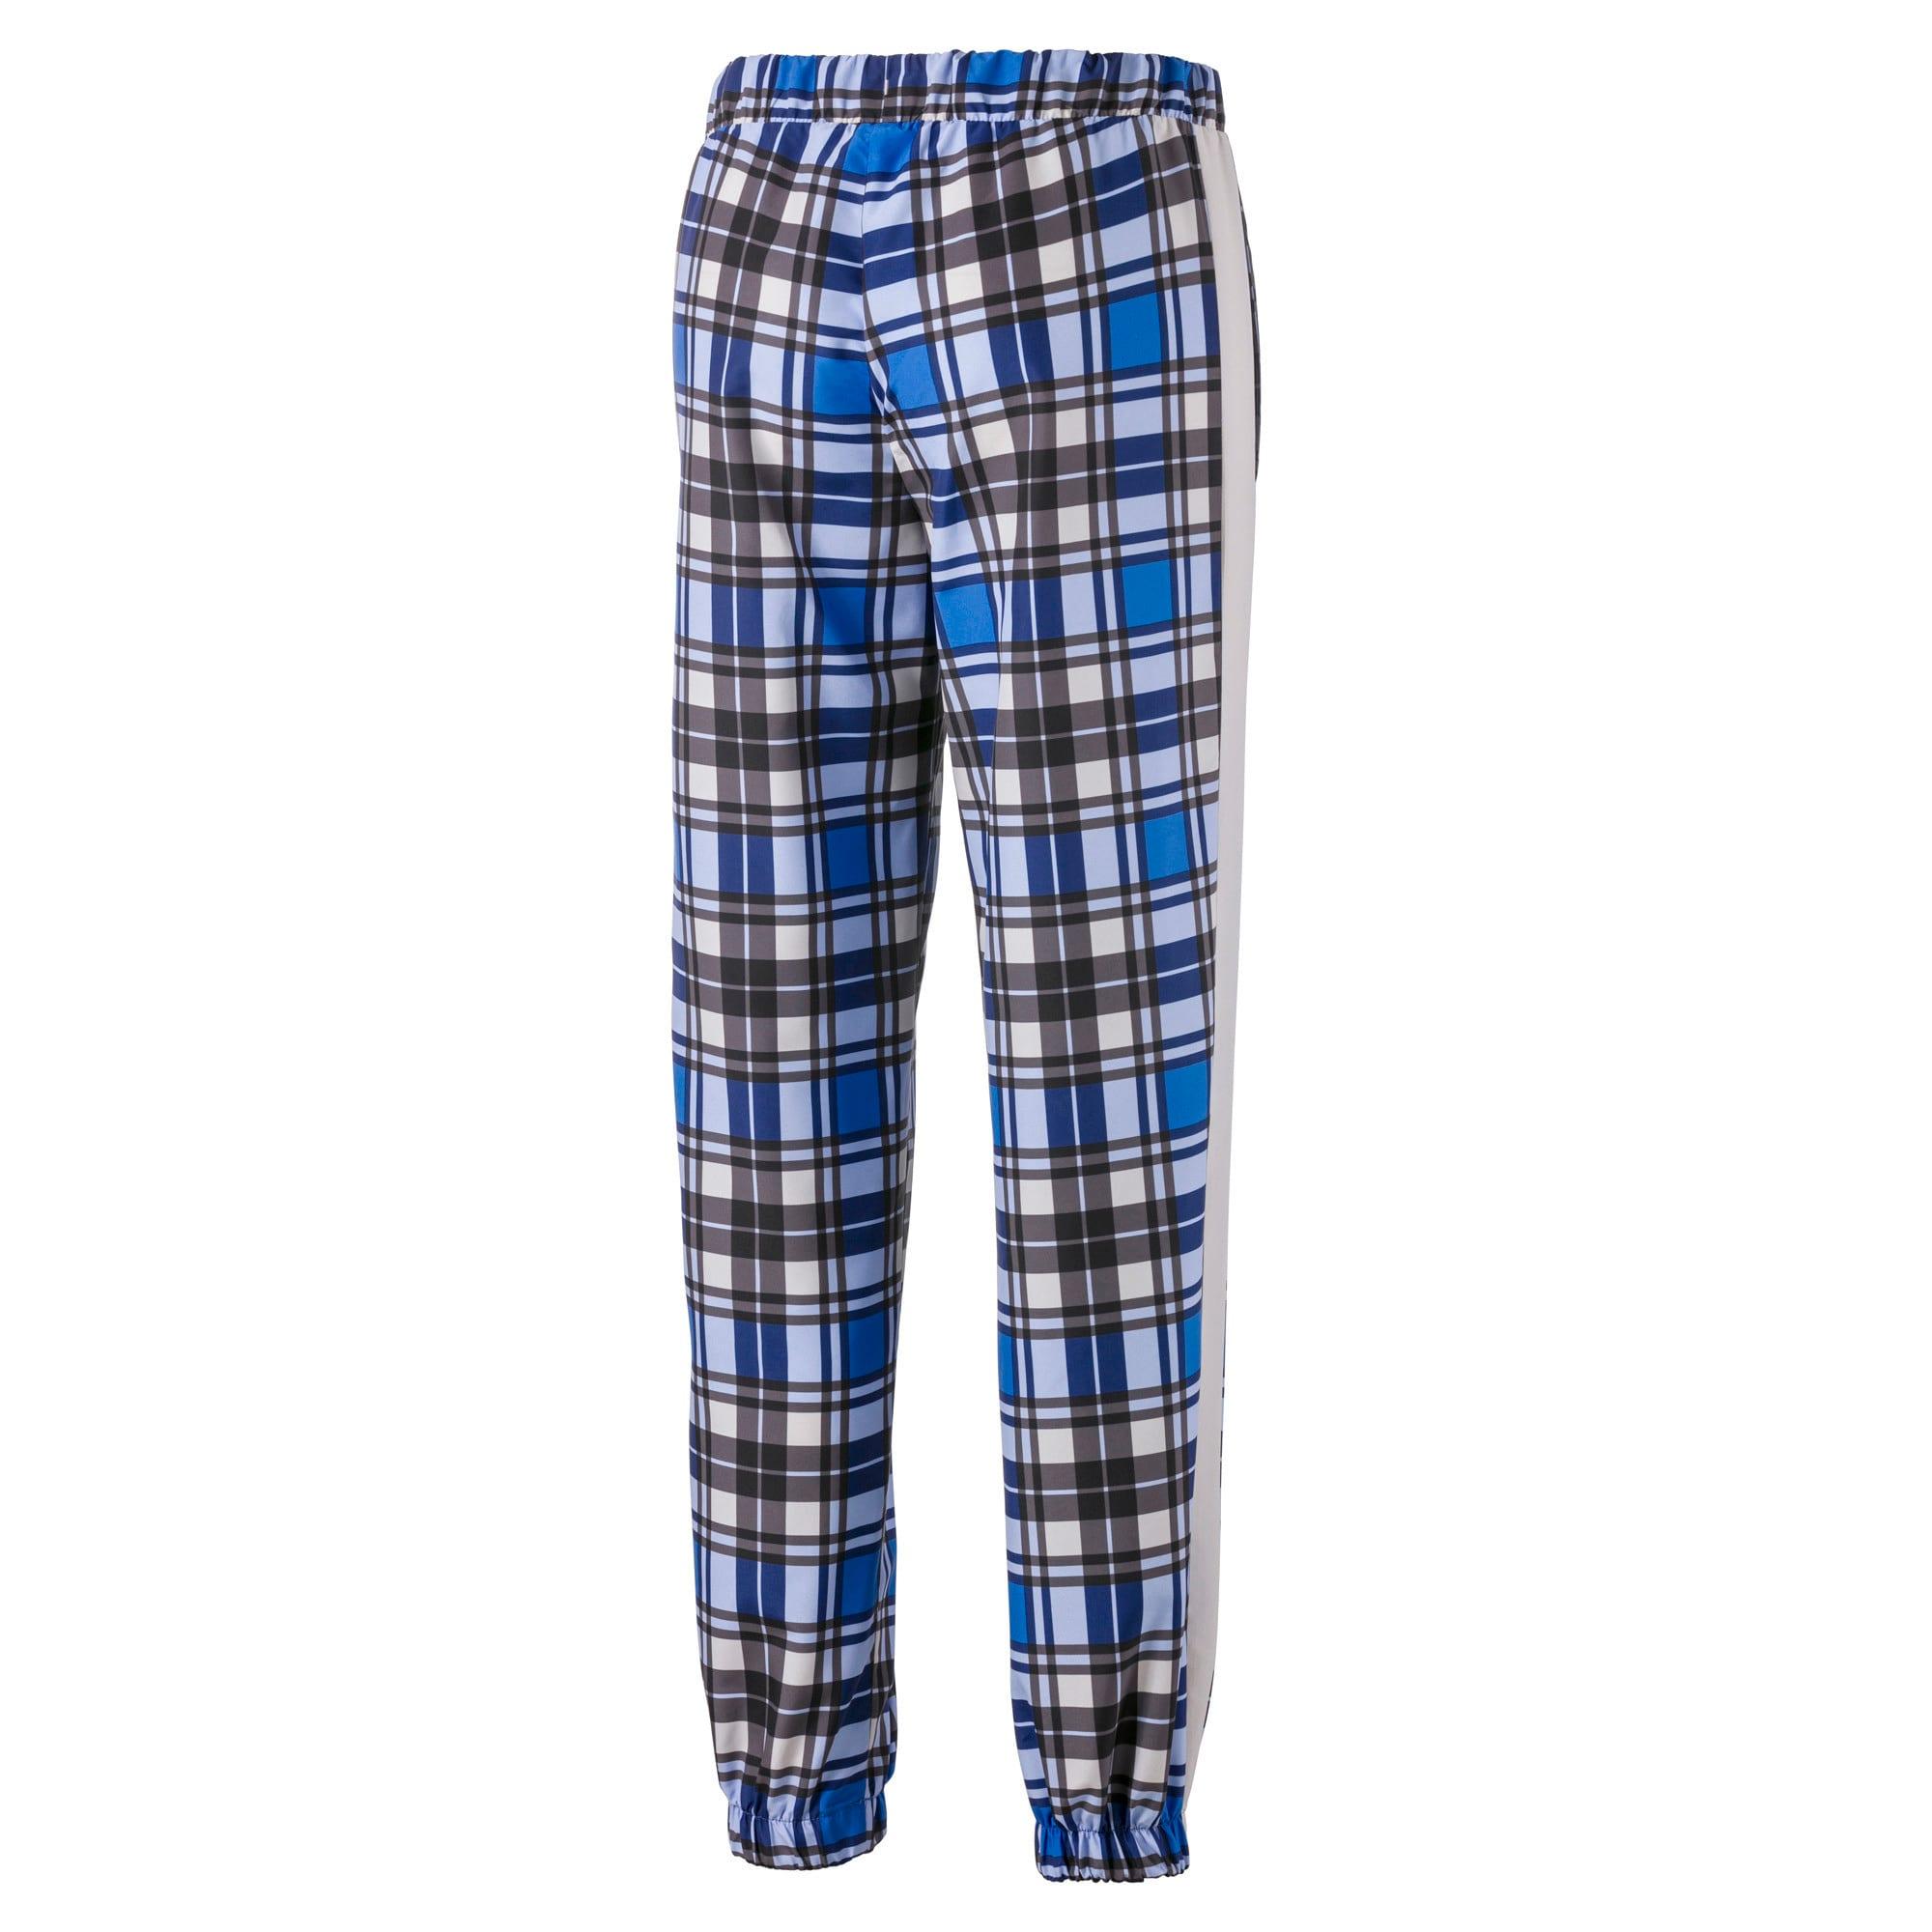 Anteprima 3 di Check Woven Women's Jog Pants, Strong Blue, medio